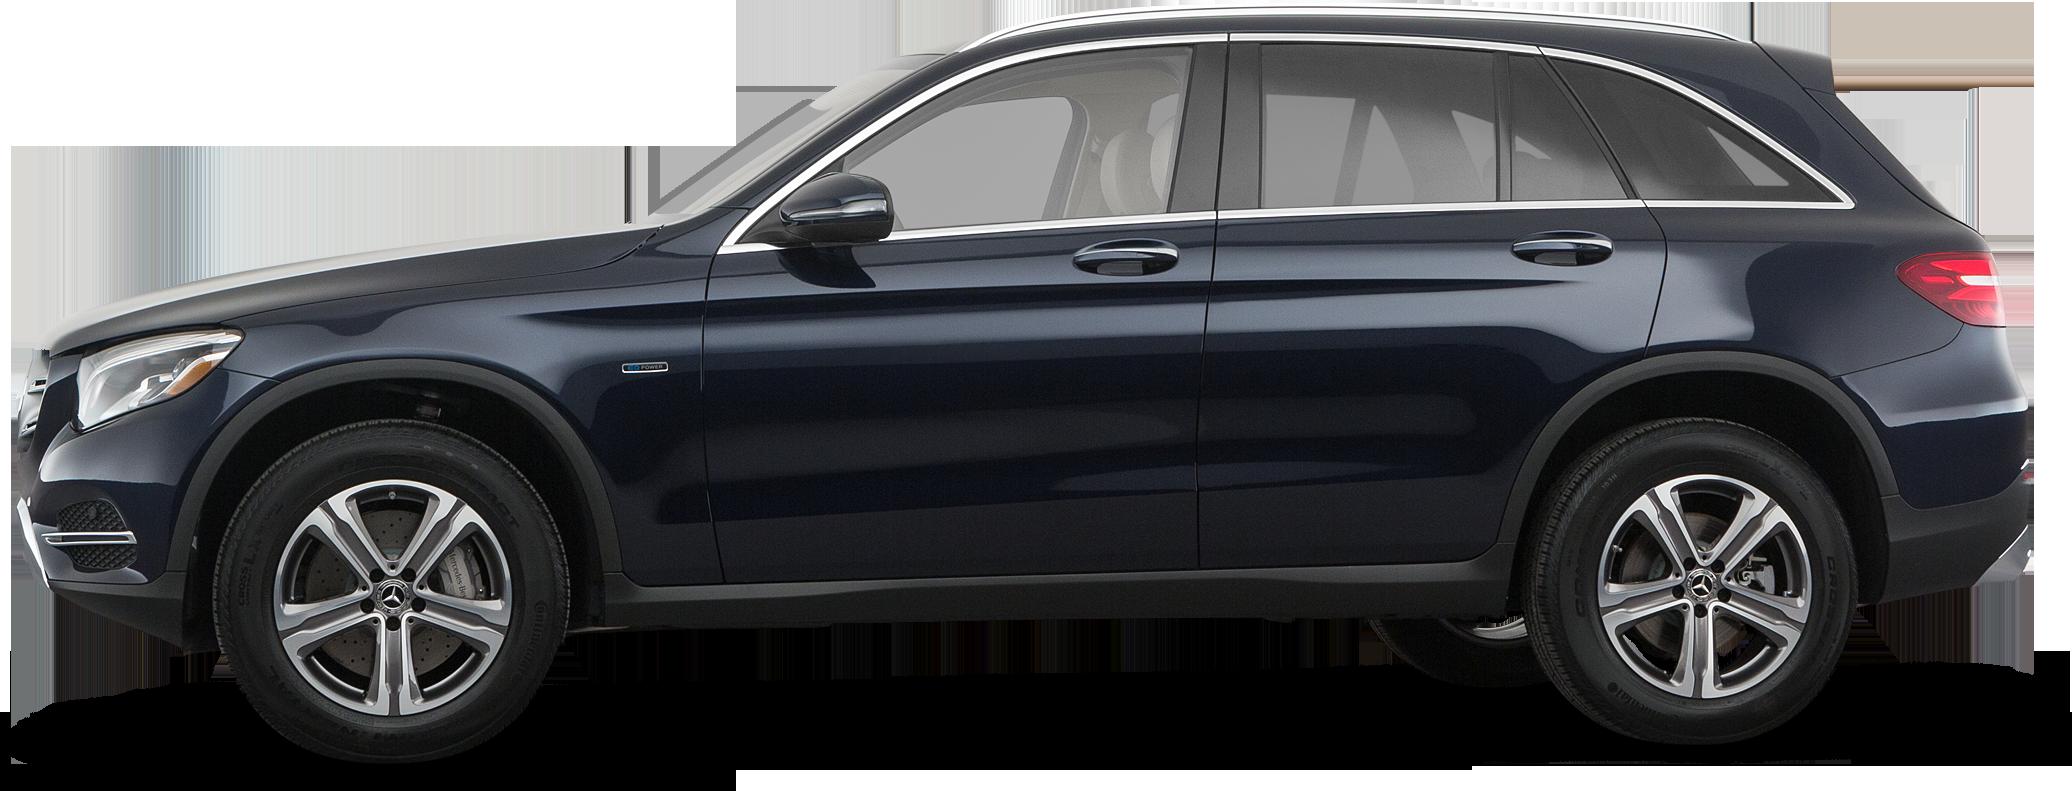 2019 Mercedes-Benz GLC 350e SUV 4MATIC